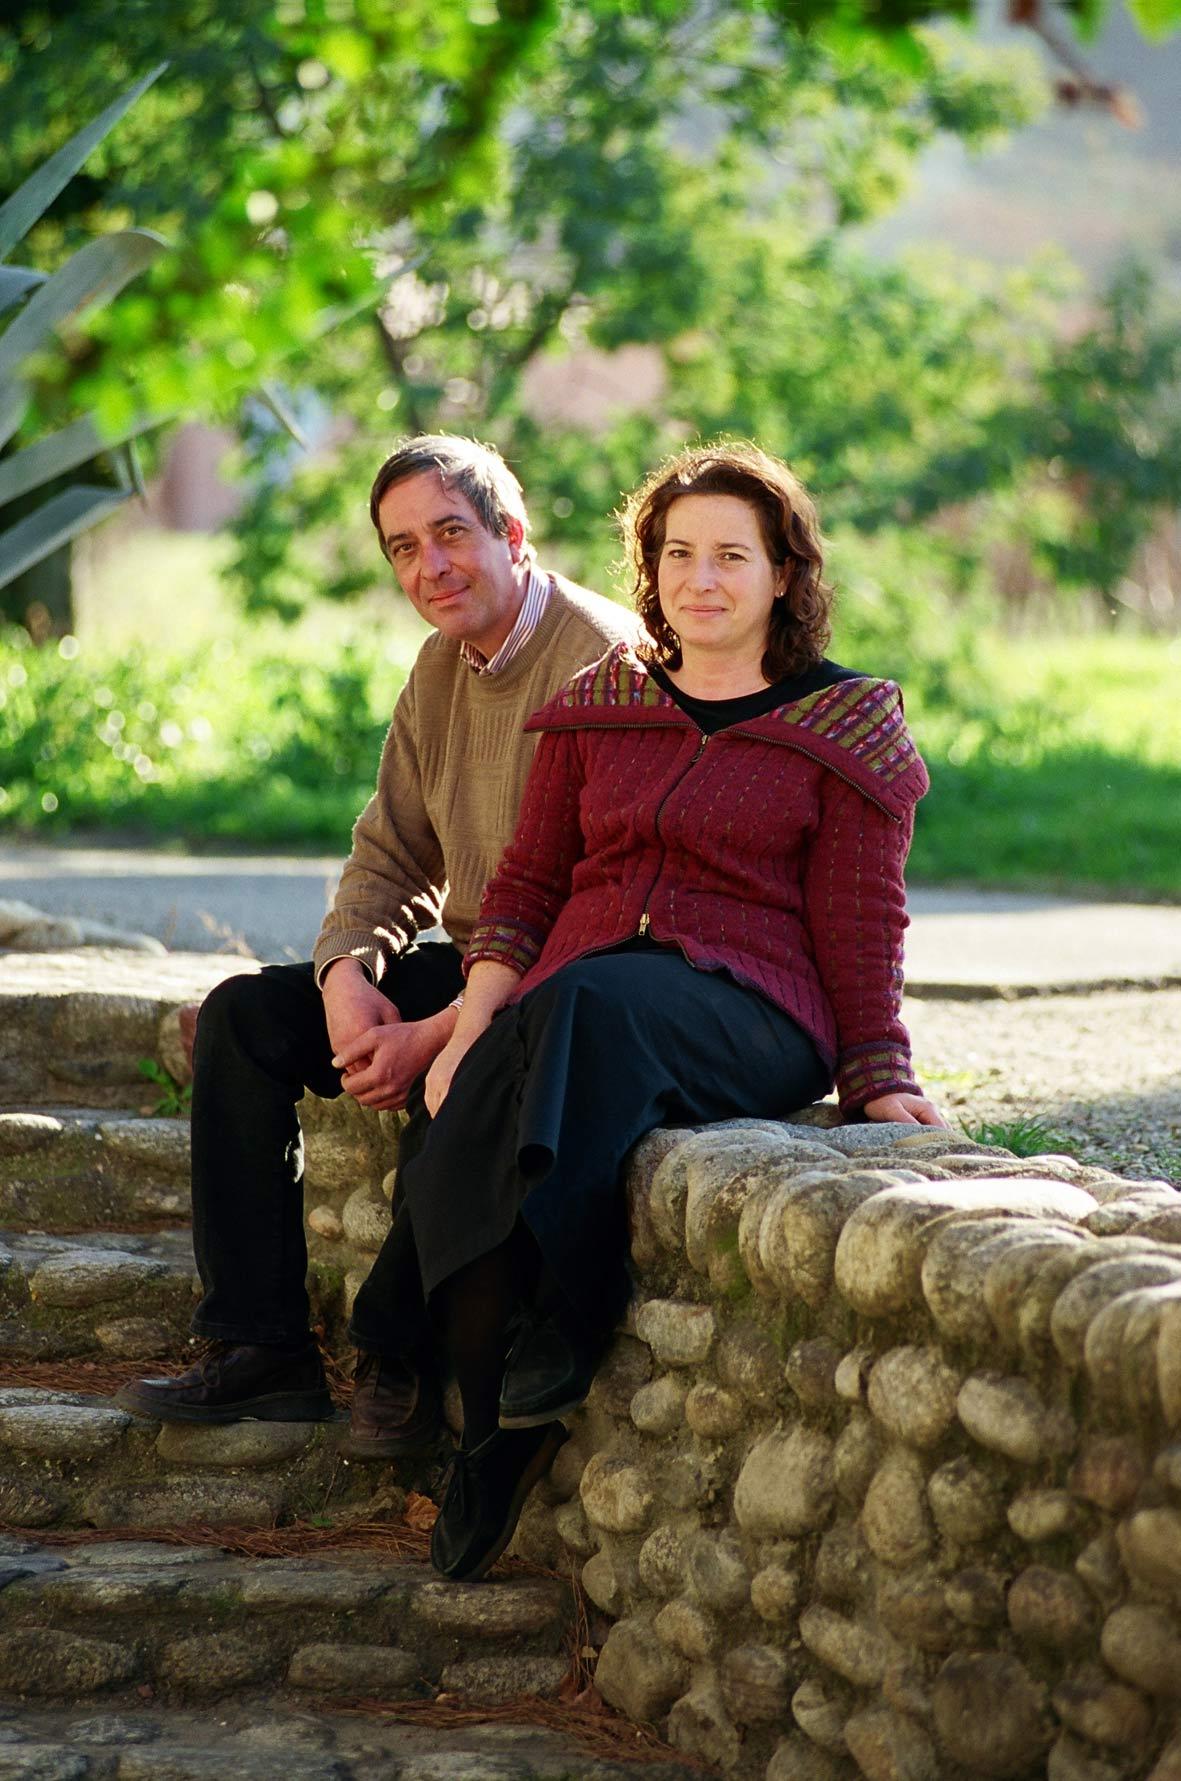 Nathalie et José Pujol von der Domaine Mas Rous